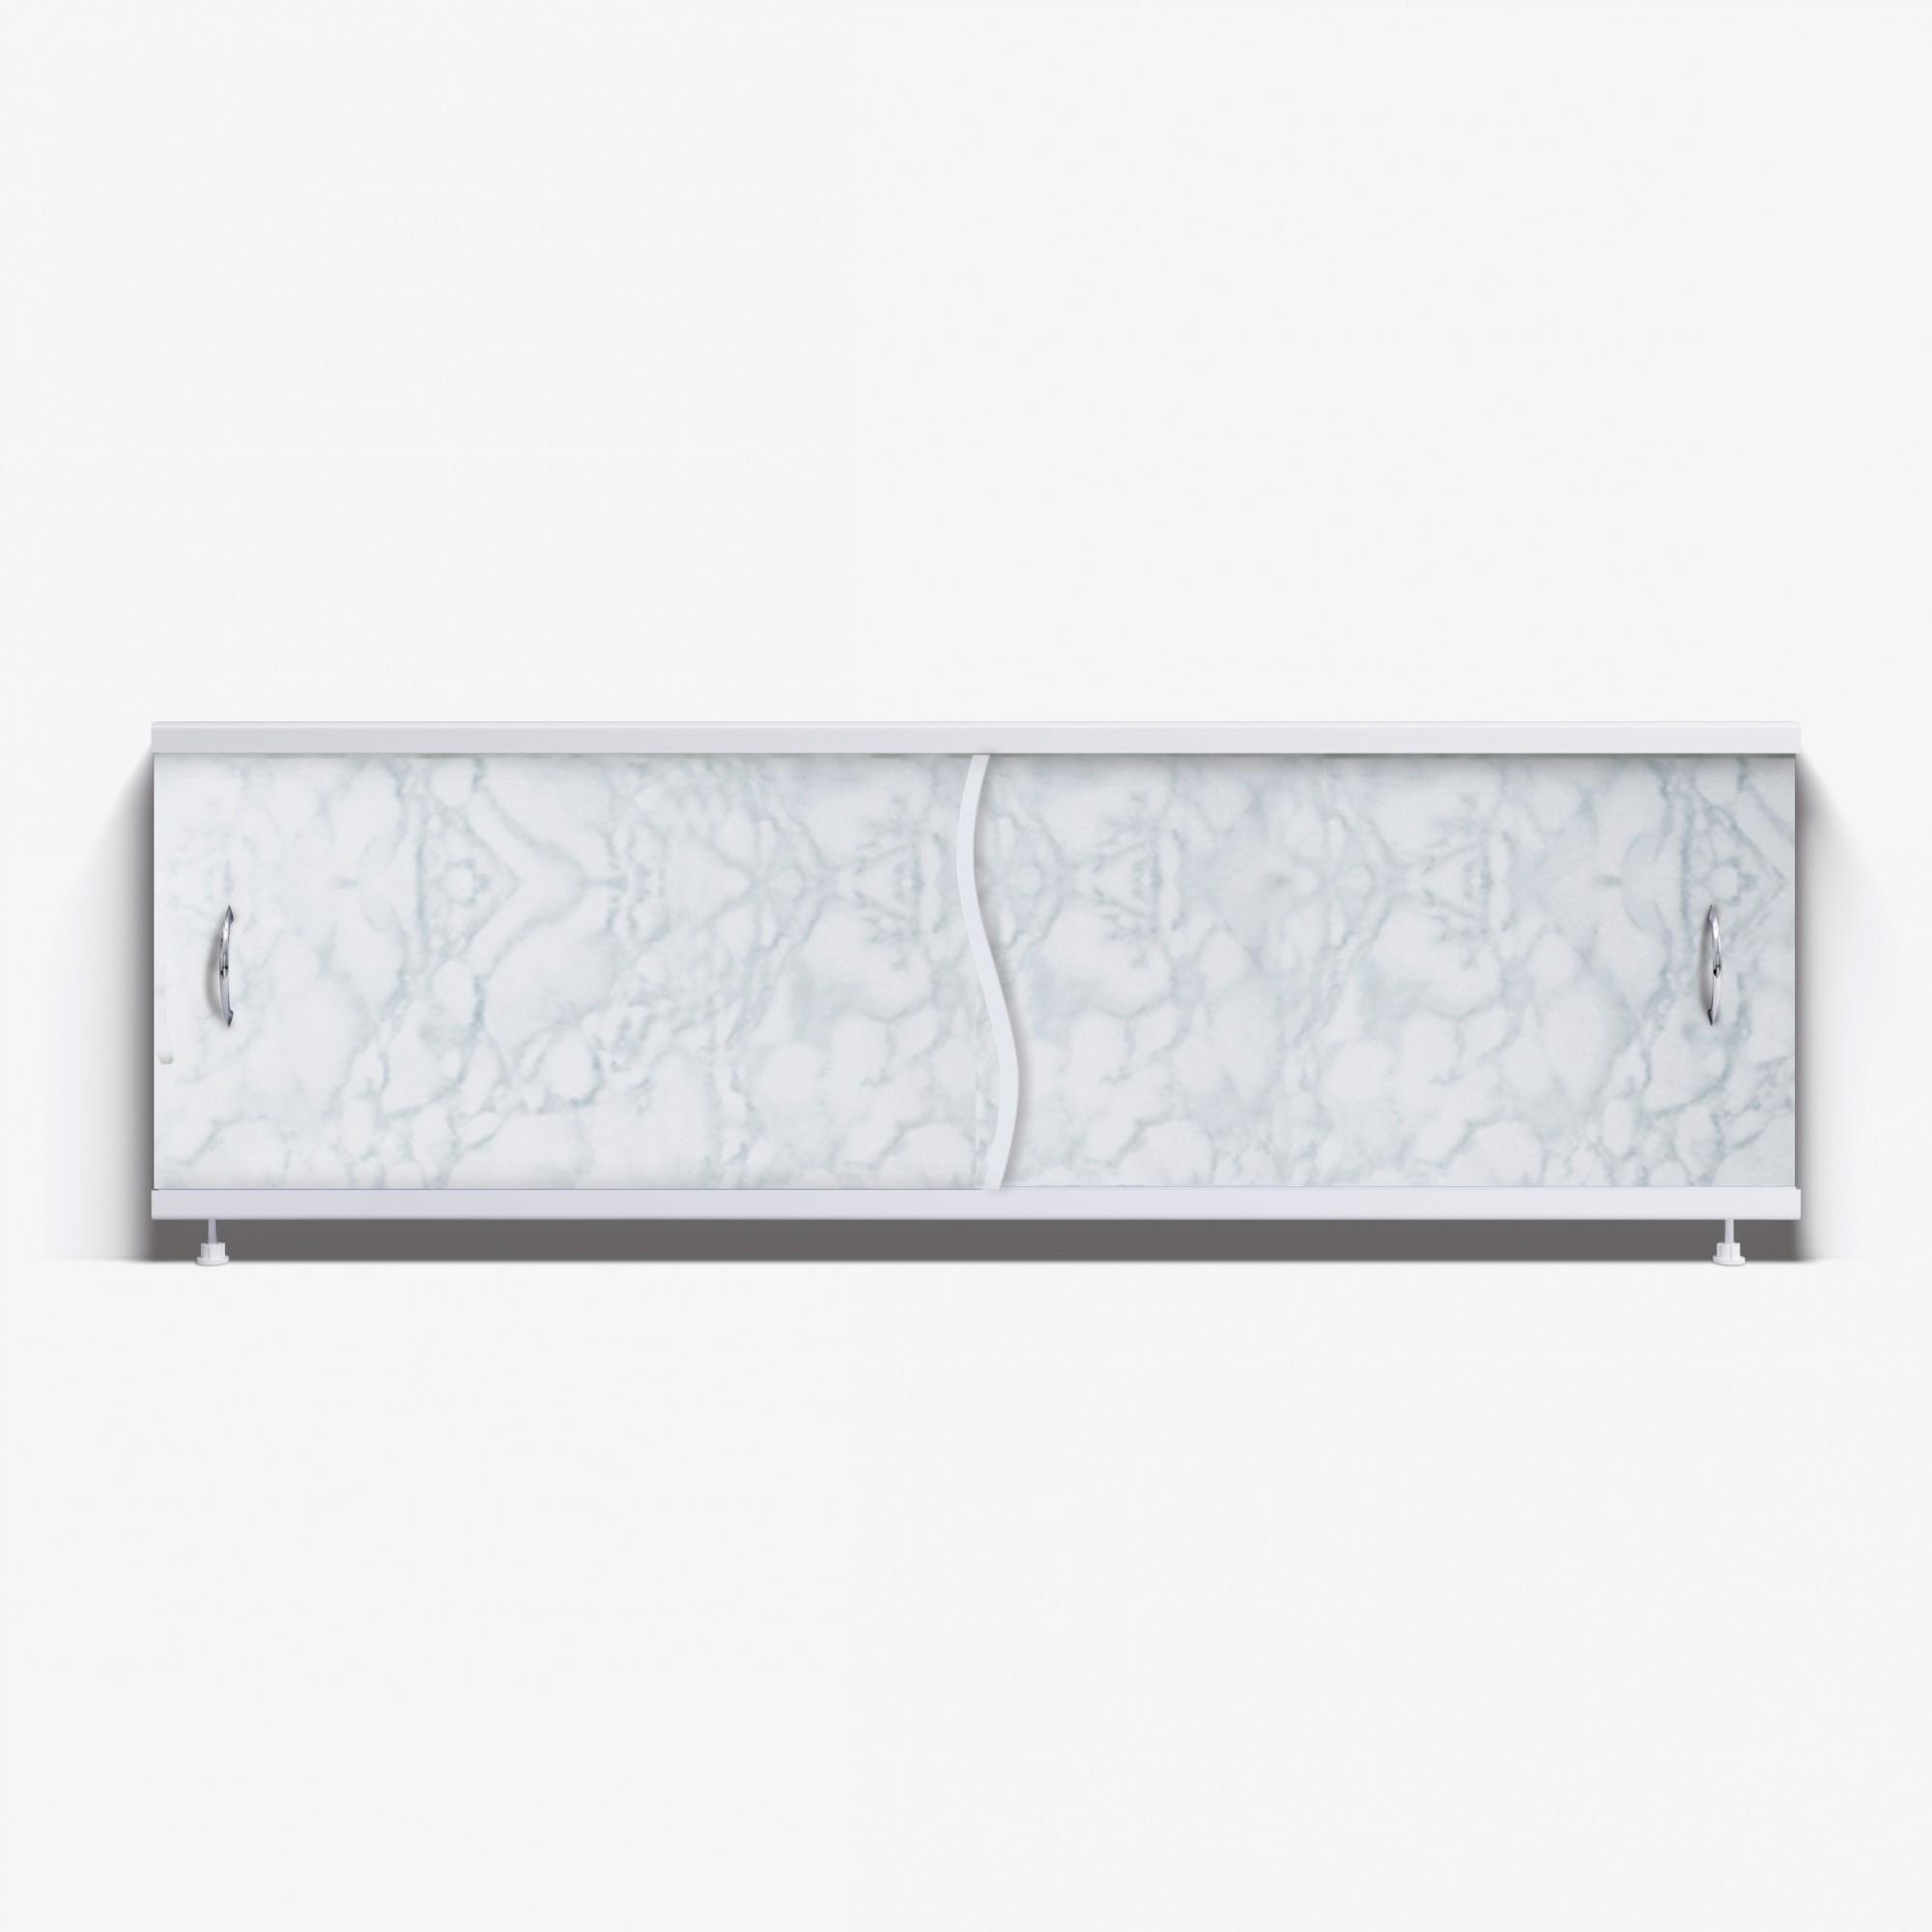 Экран под ванну Премьер 170 светло-серый мрамор